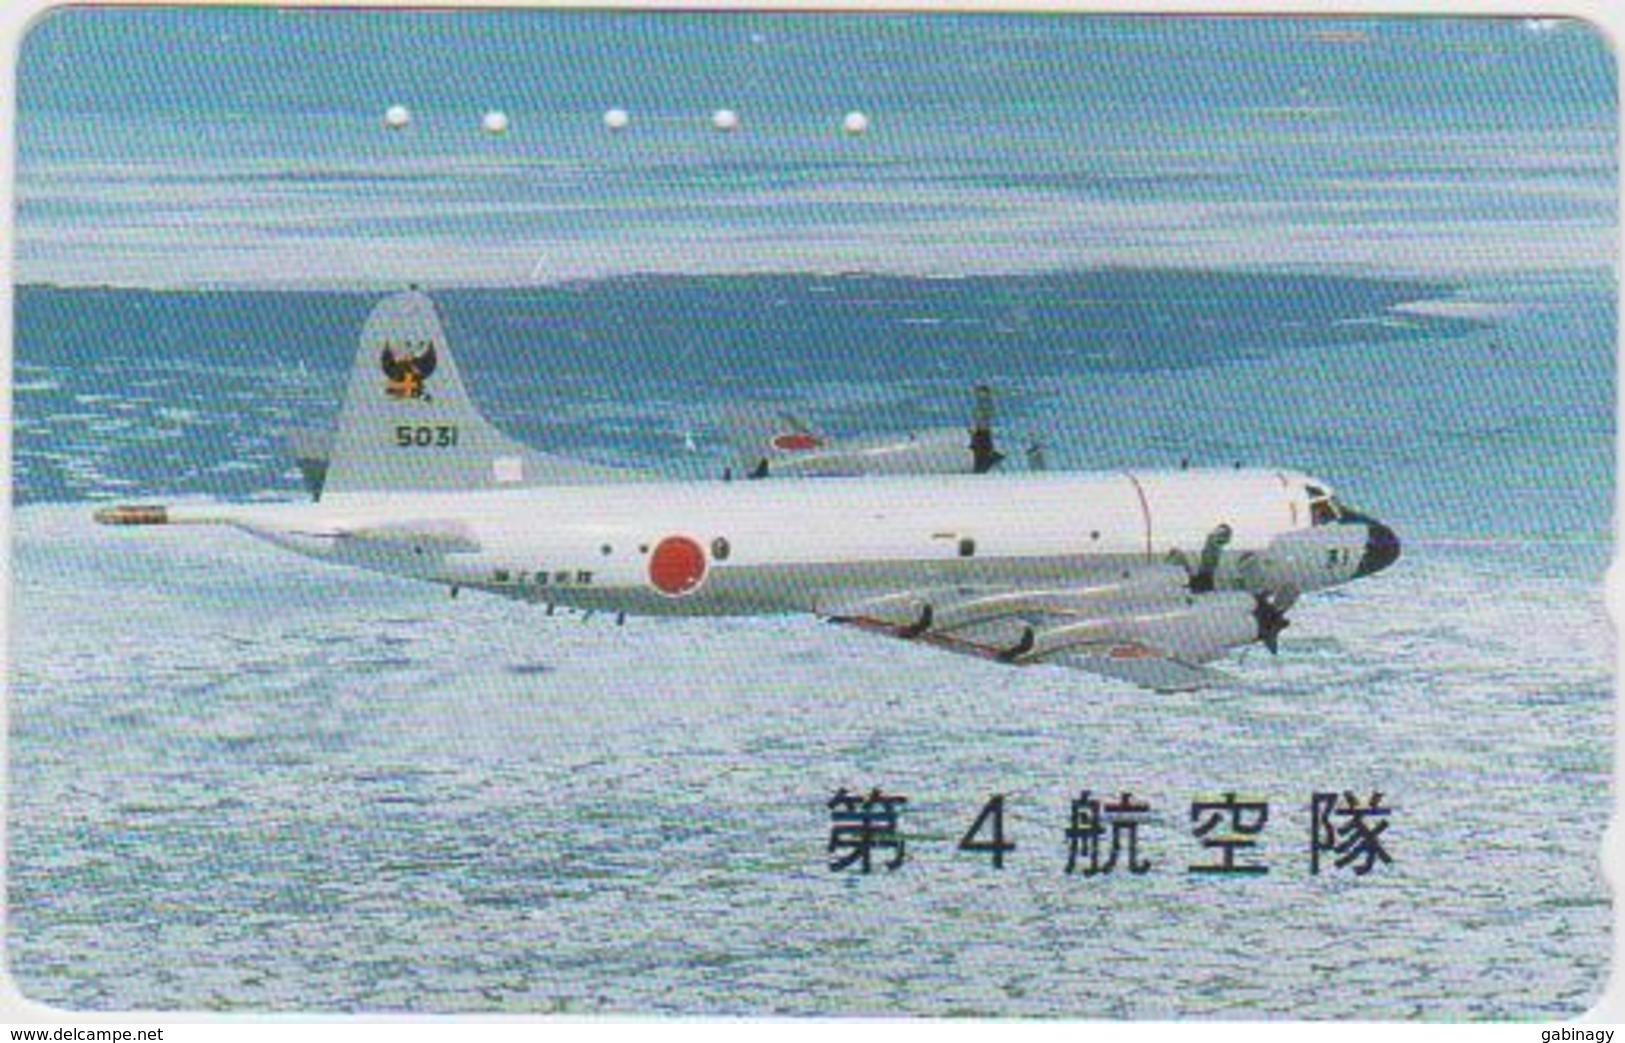 AIRPLANE - JAPAN-229 - MILITARY - Avions